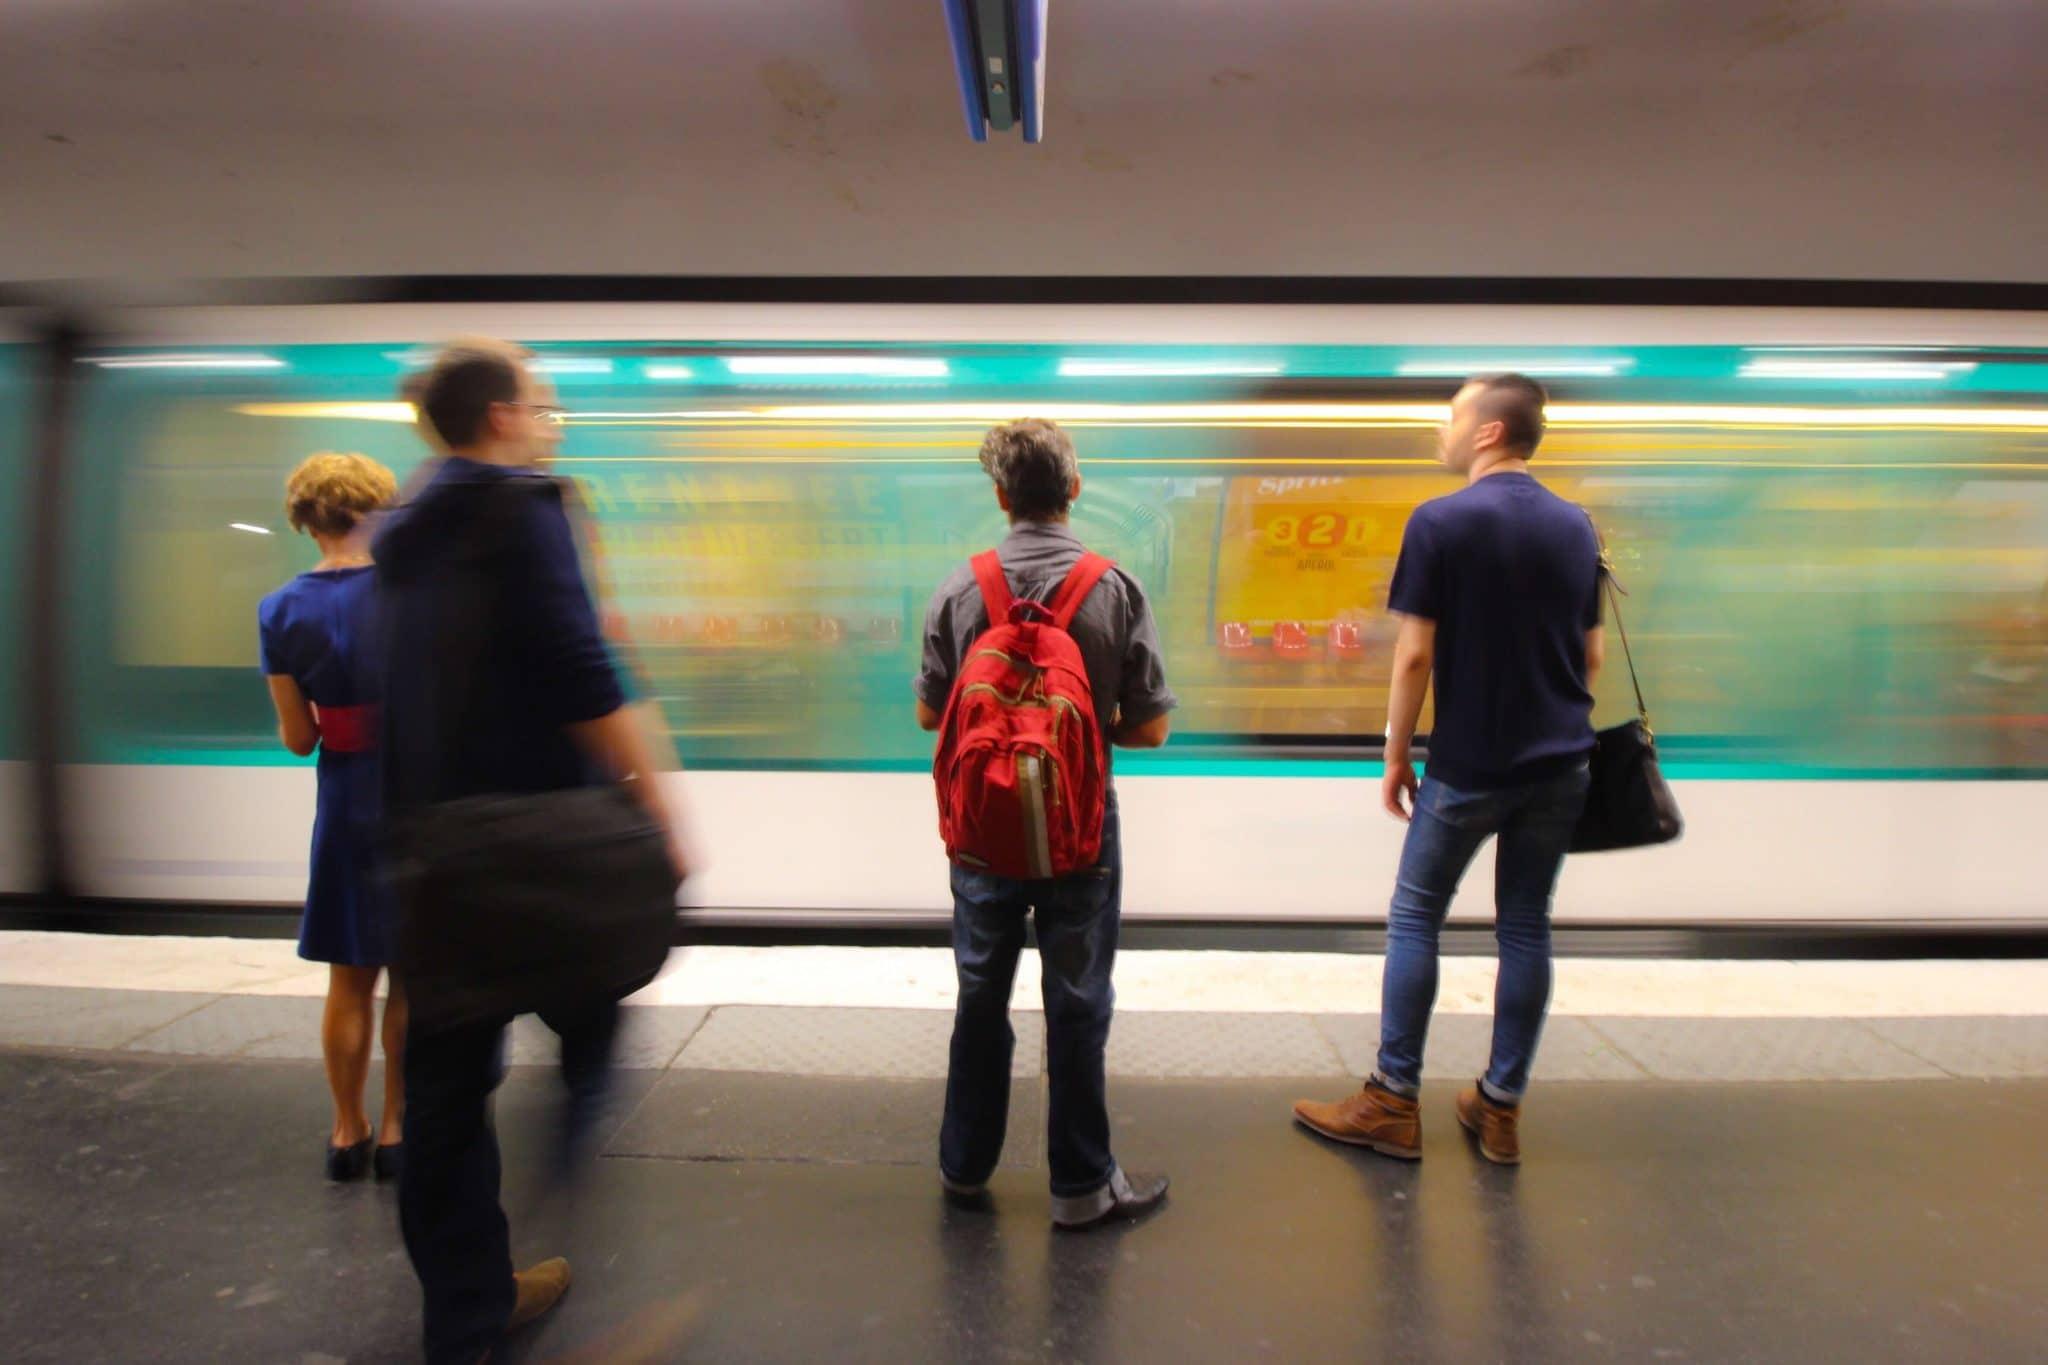 paris-metro-4RG8XSN (1)